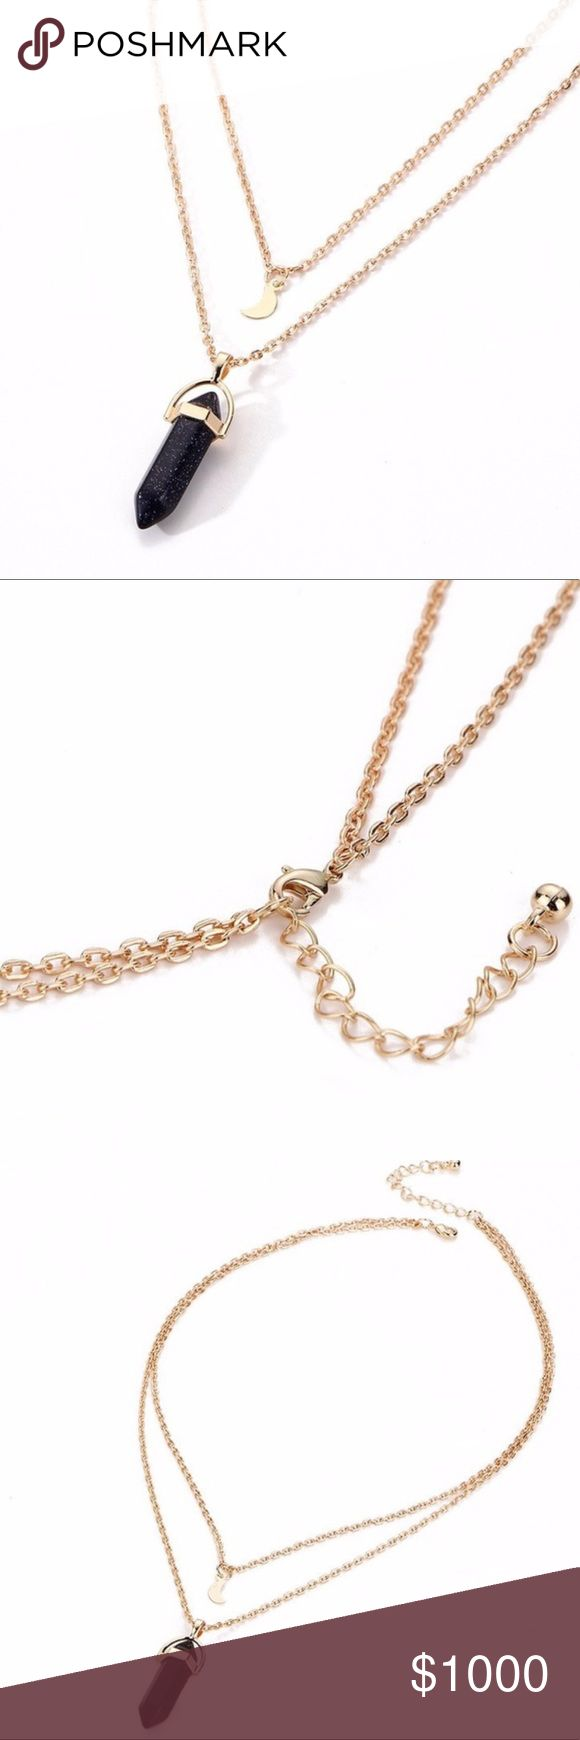 best 25+ layered choker necklace ideas on pinterest | layered